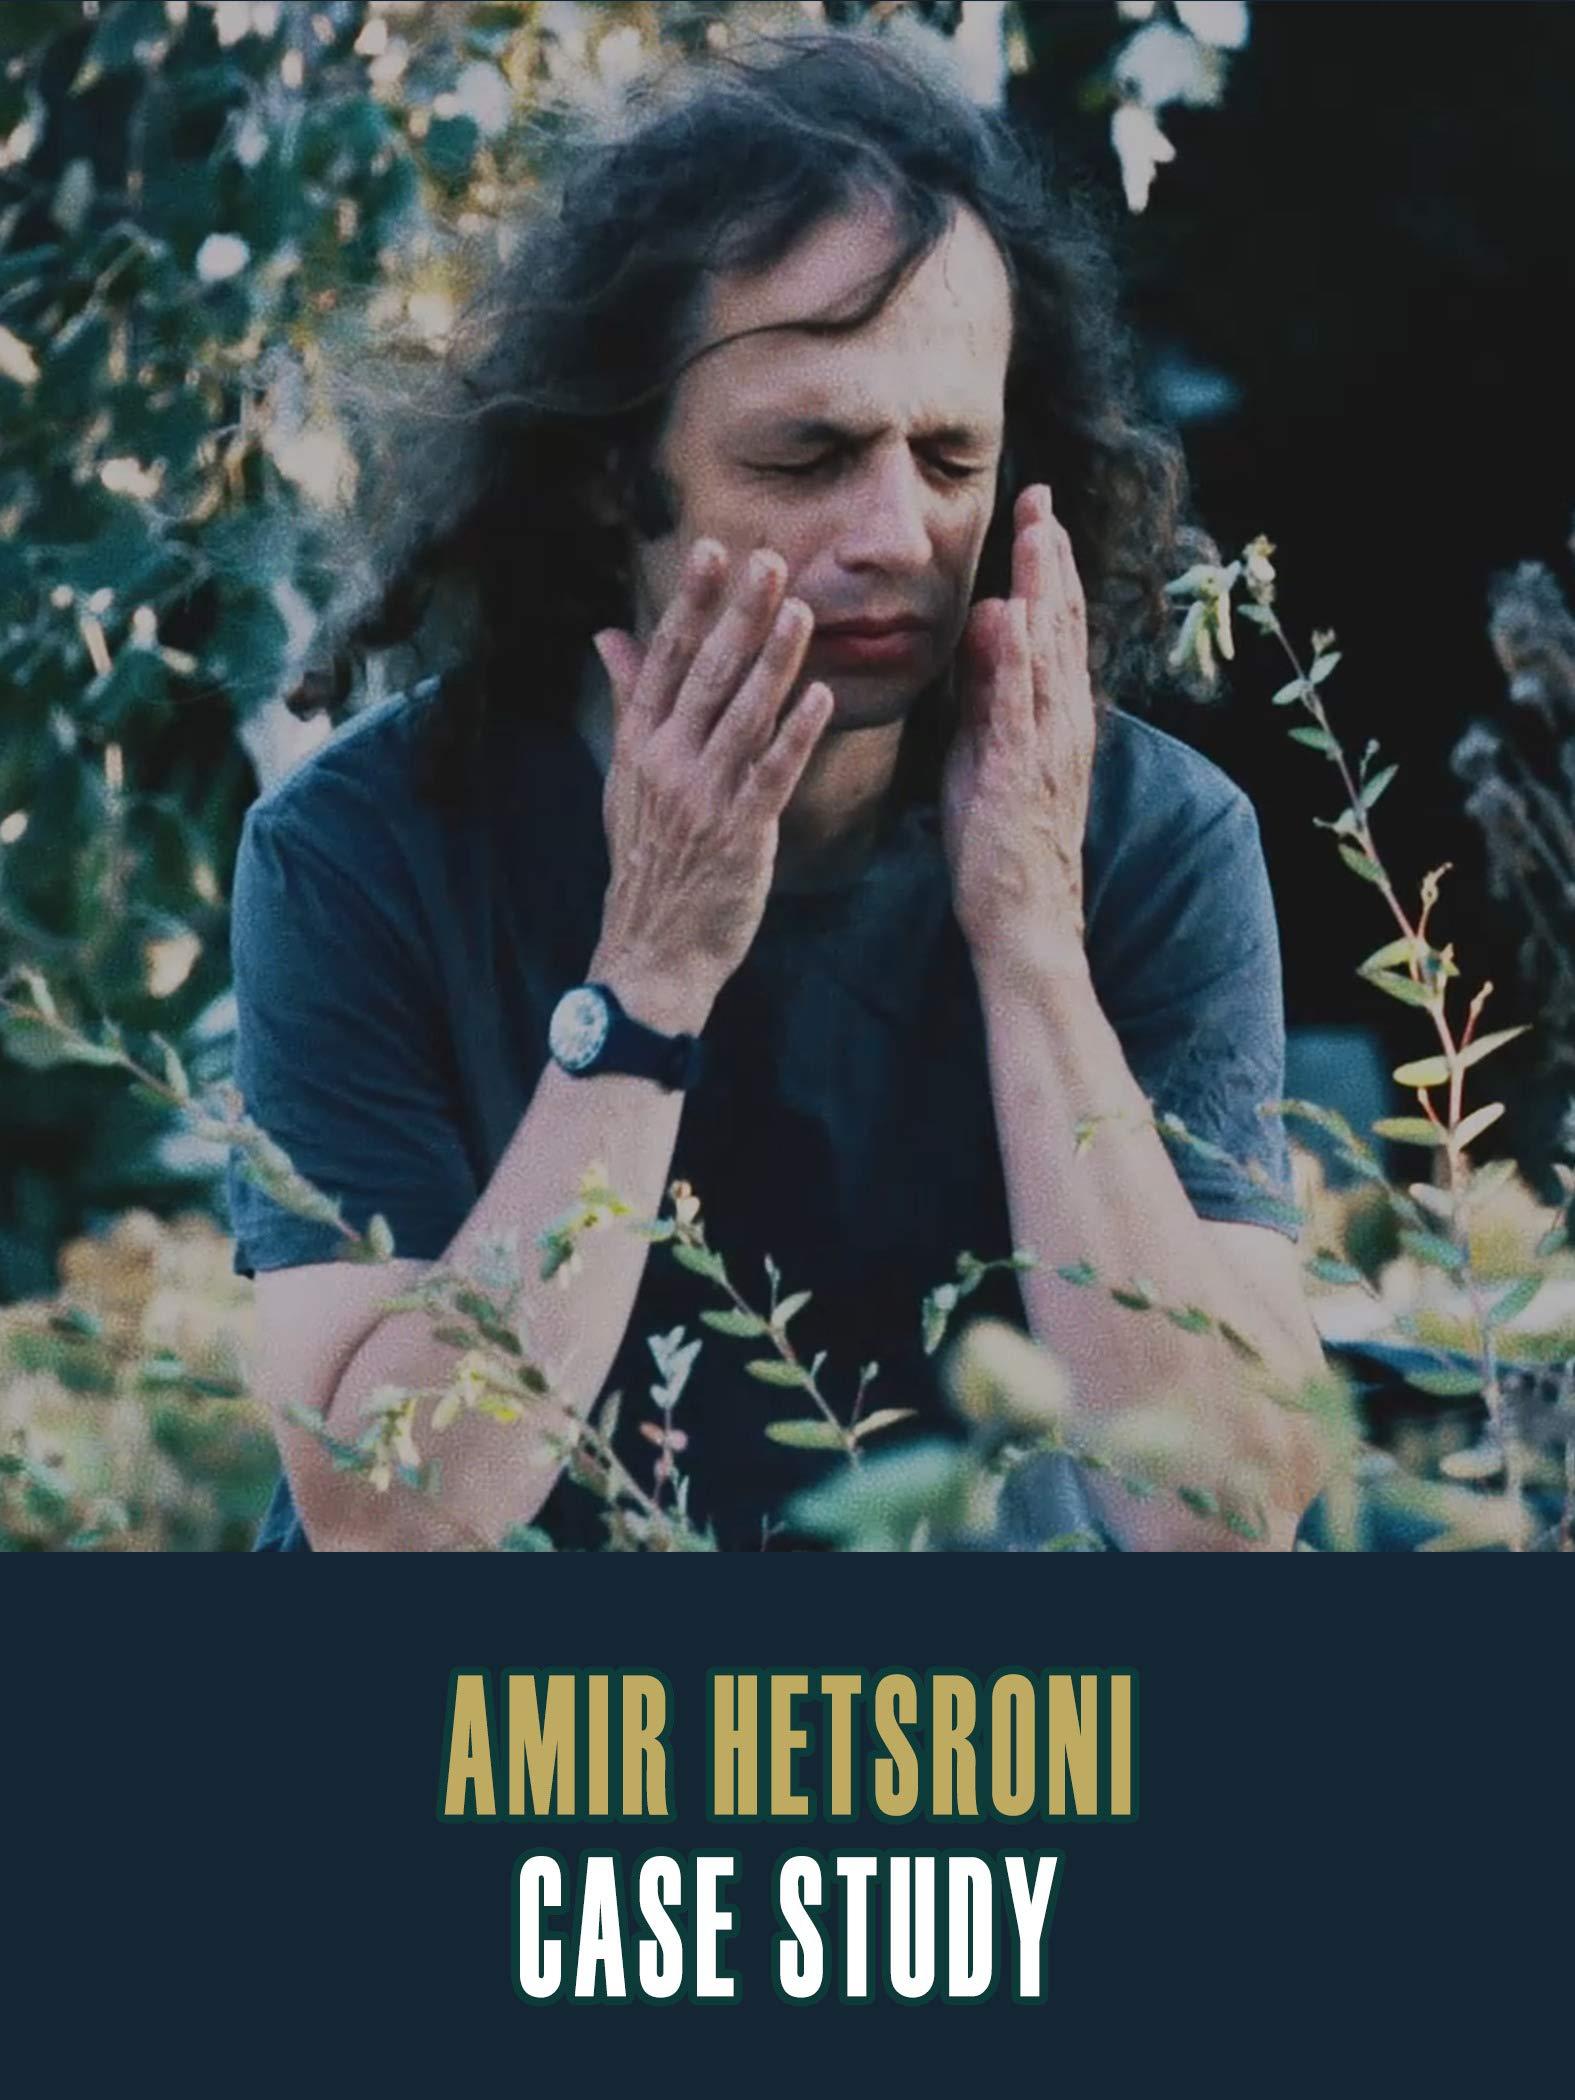 Amir Hetsroni: Case Study on Amazon Prime Video UK